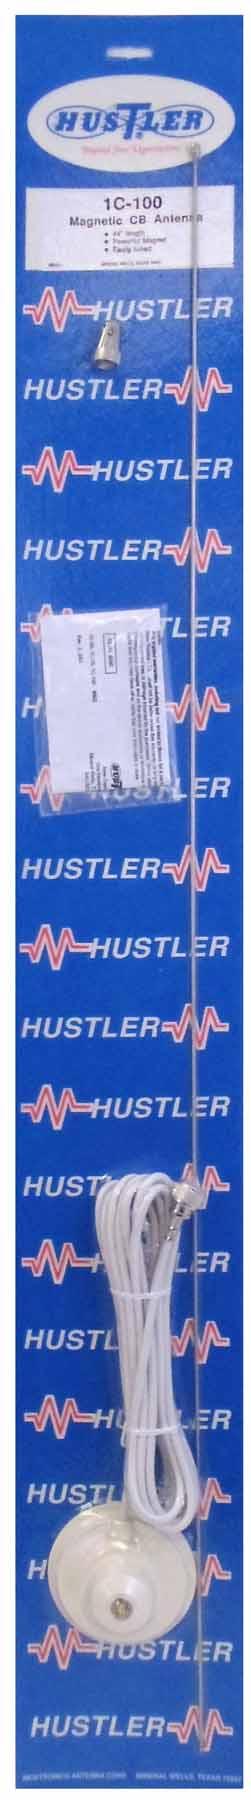 "IC100-W - Hustler 44"" Base Loaded Magnet Mount Antenna Kit -White"